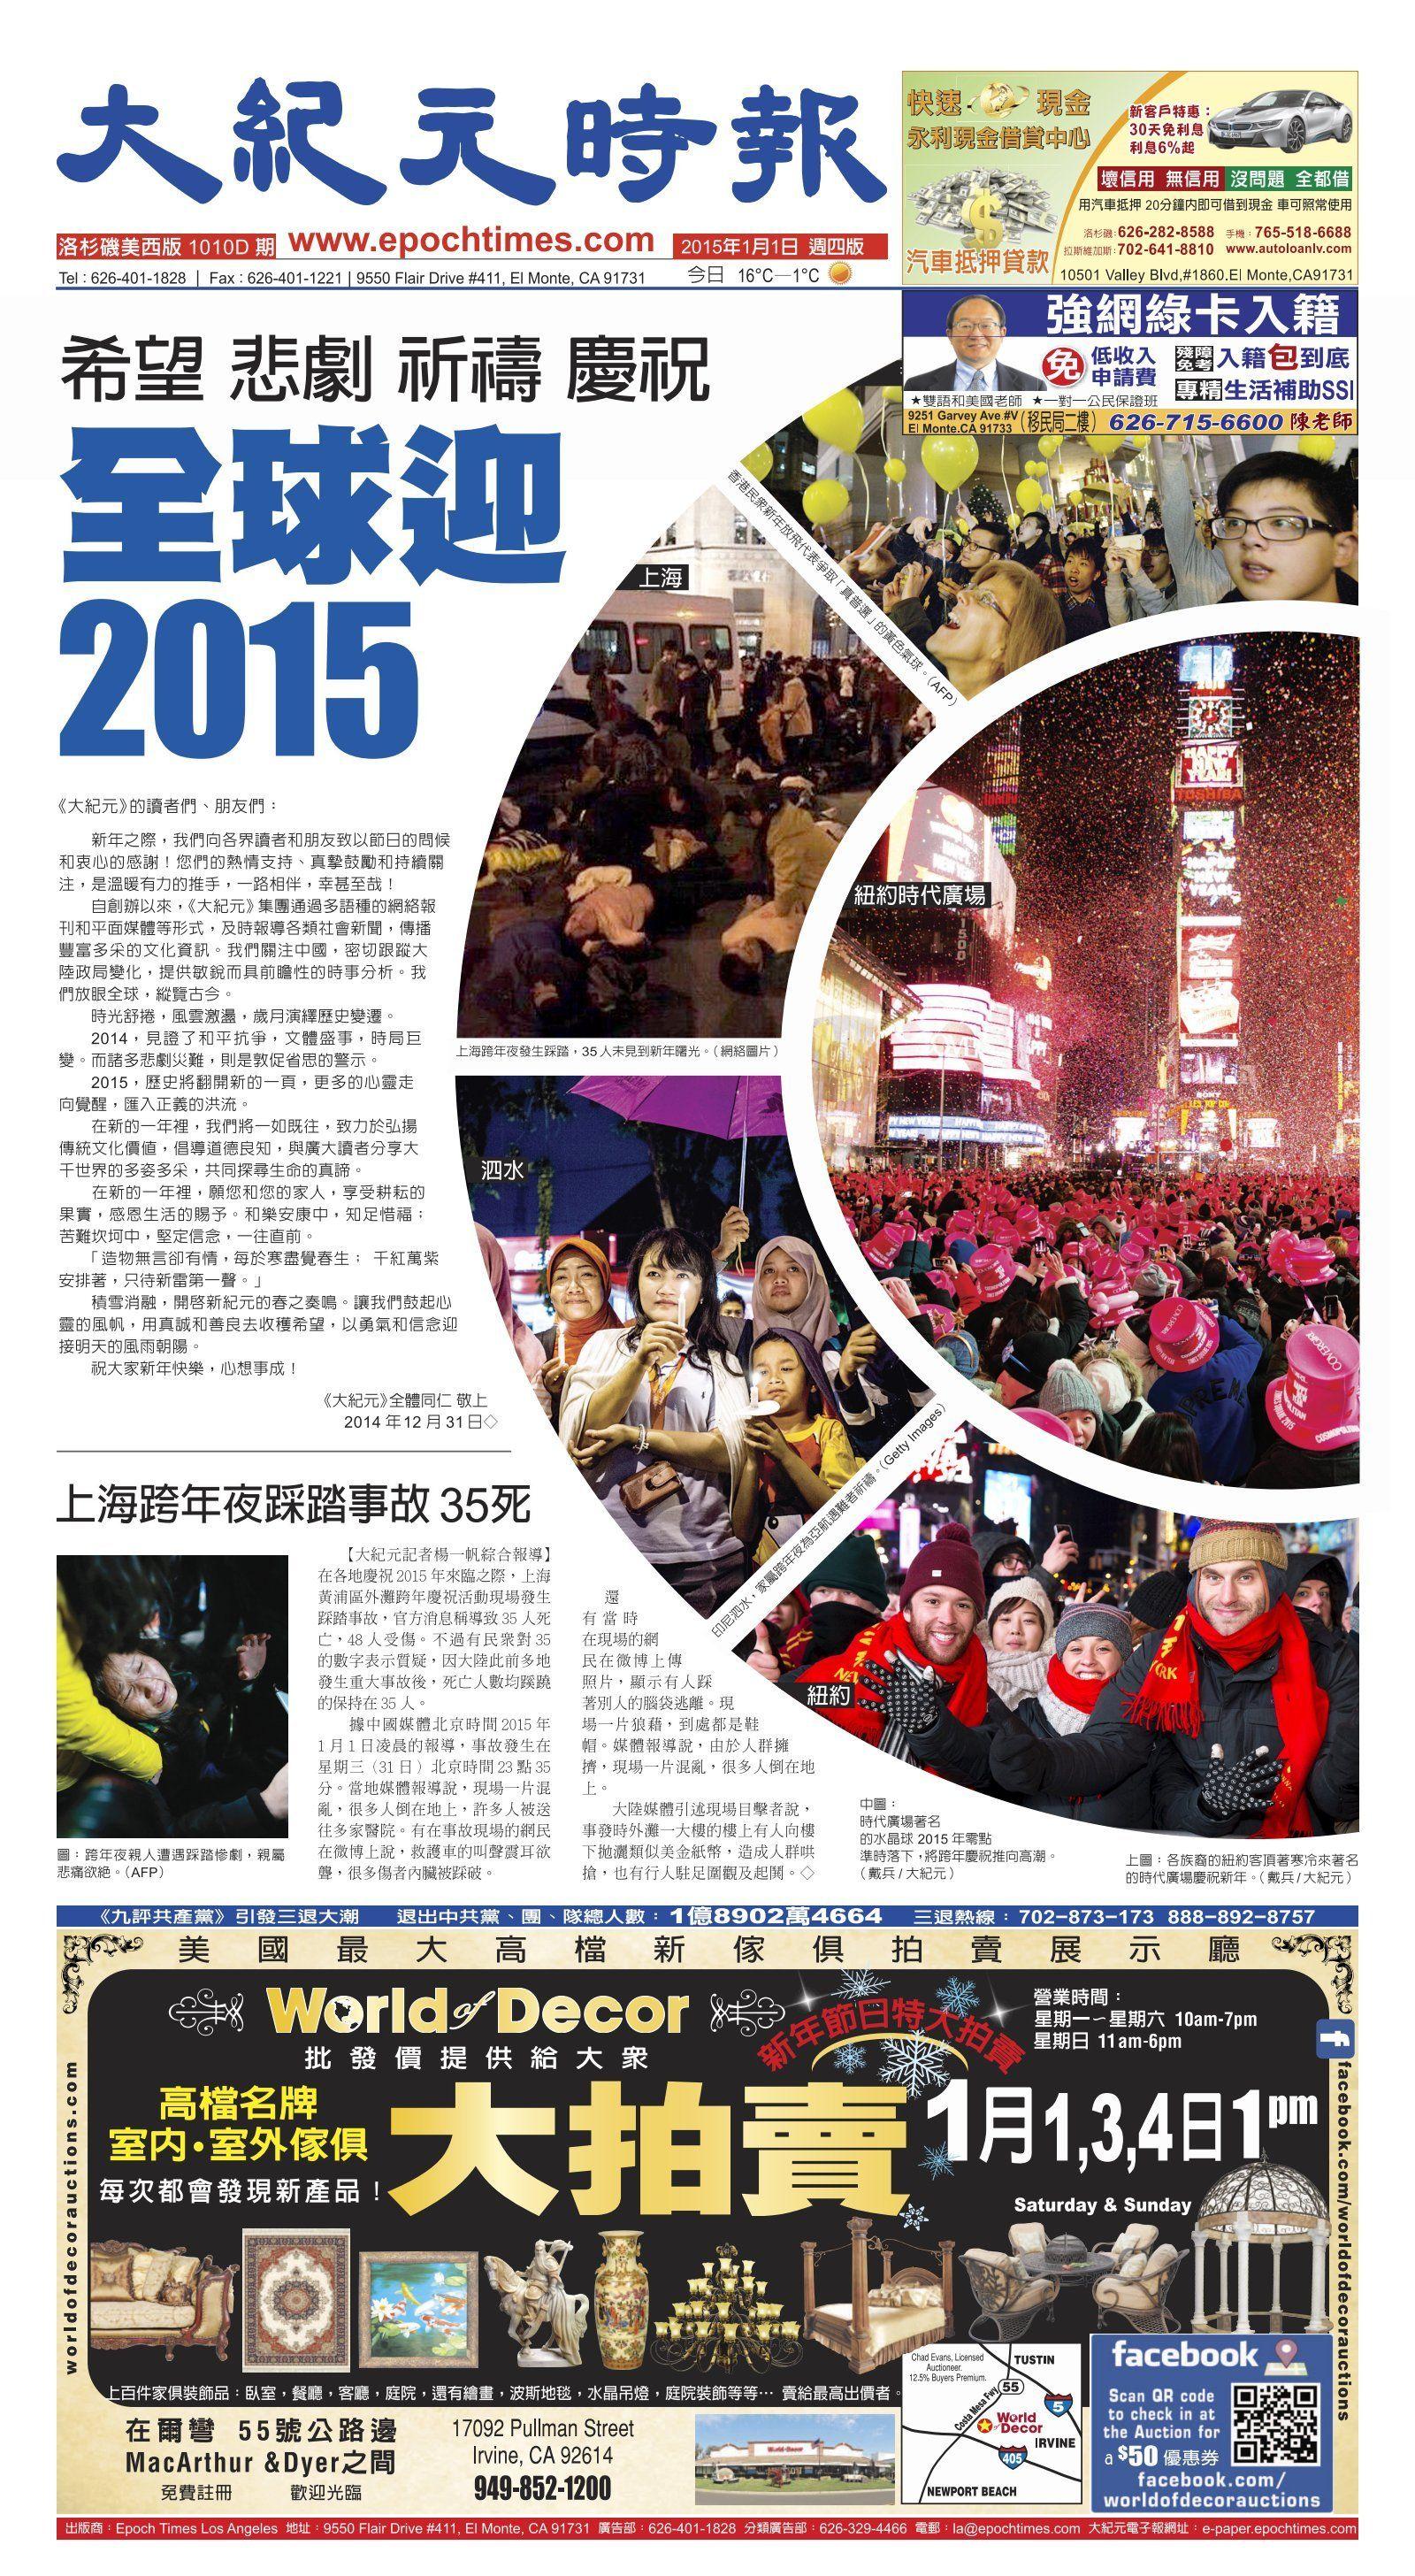 希望 悲劇 祈禱 慶祝 全球迎2015 http://e-paper.epochtimes.com/LosAngeles/20150101_1010D/djylax_1010D_20150101_01.jpg.html